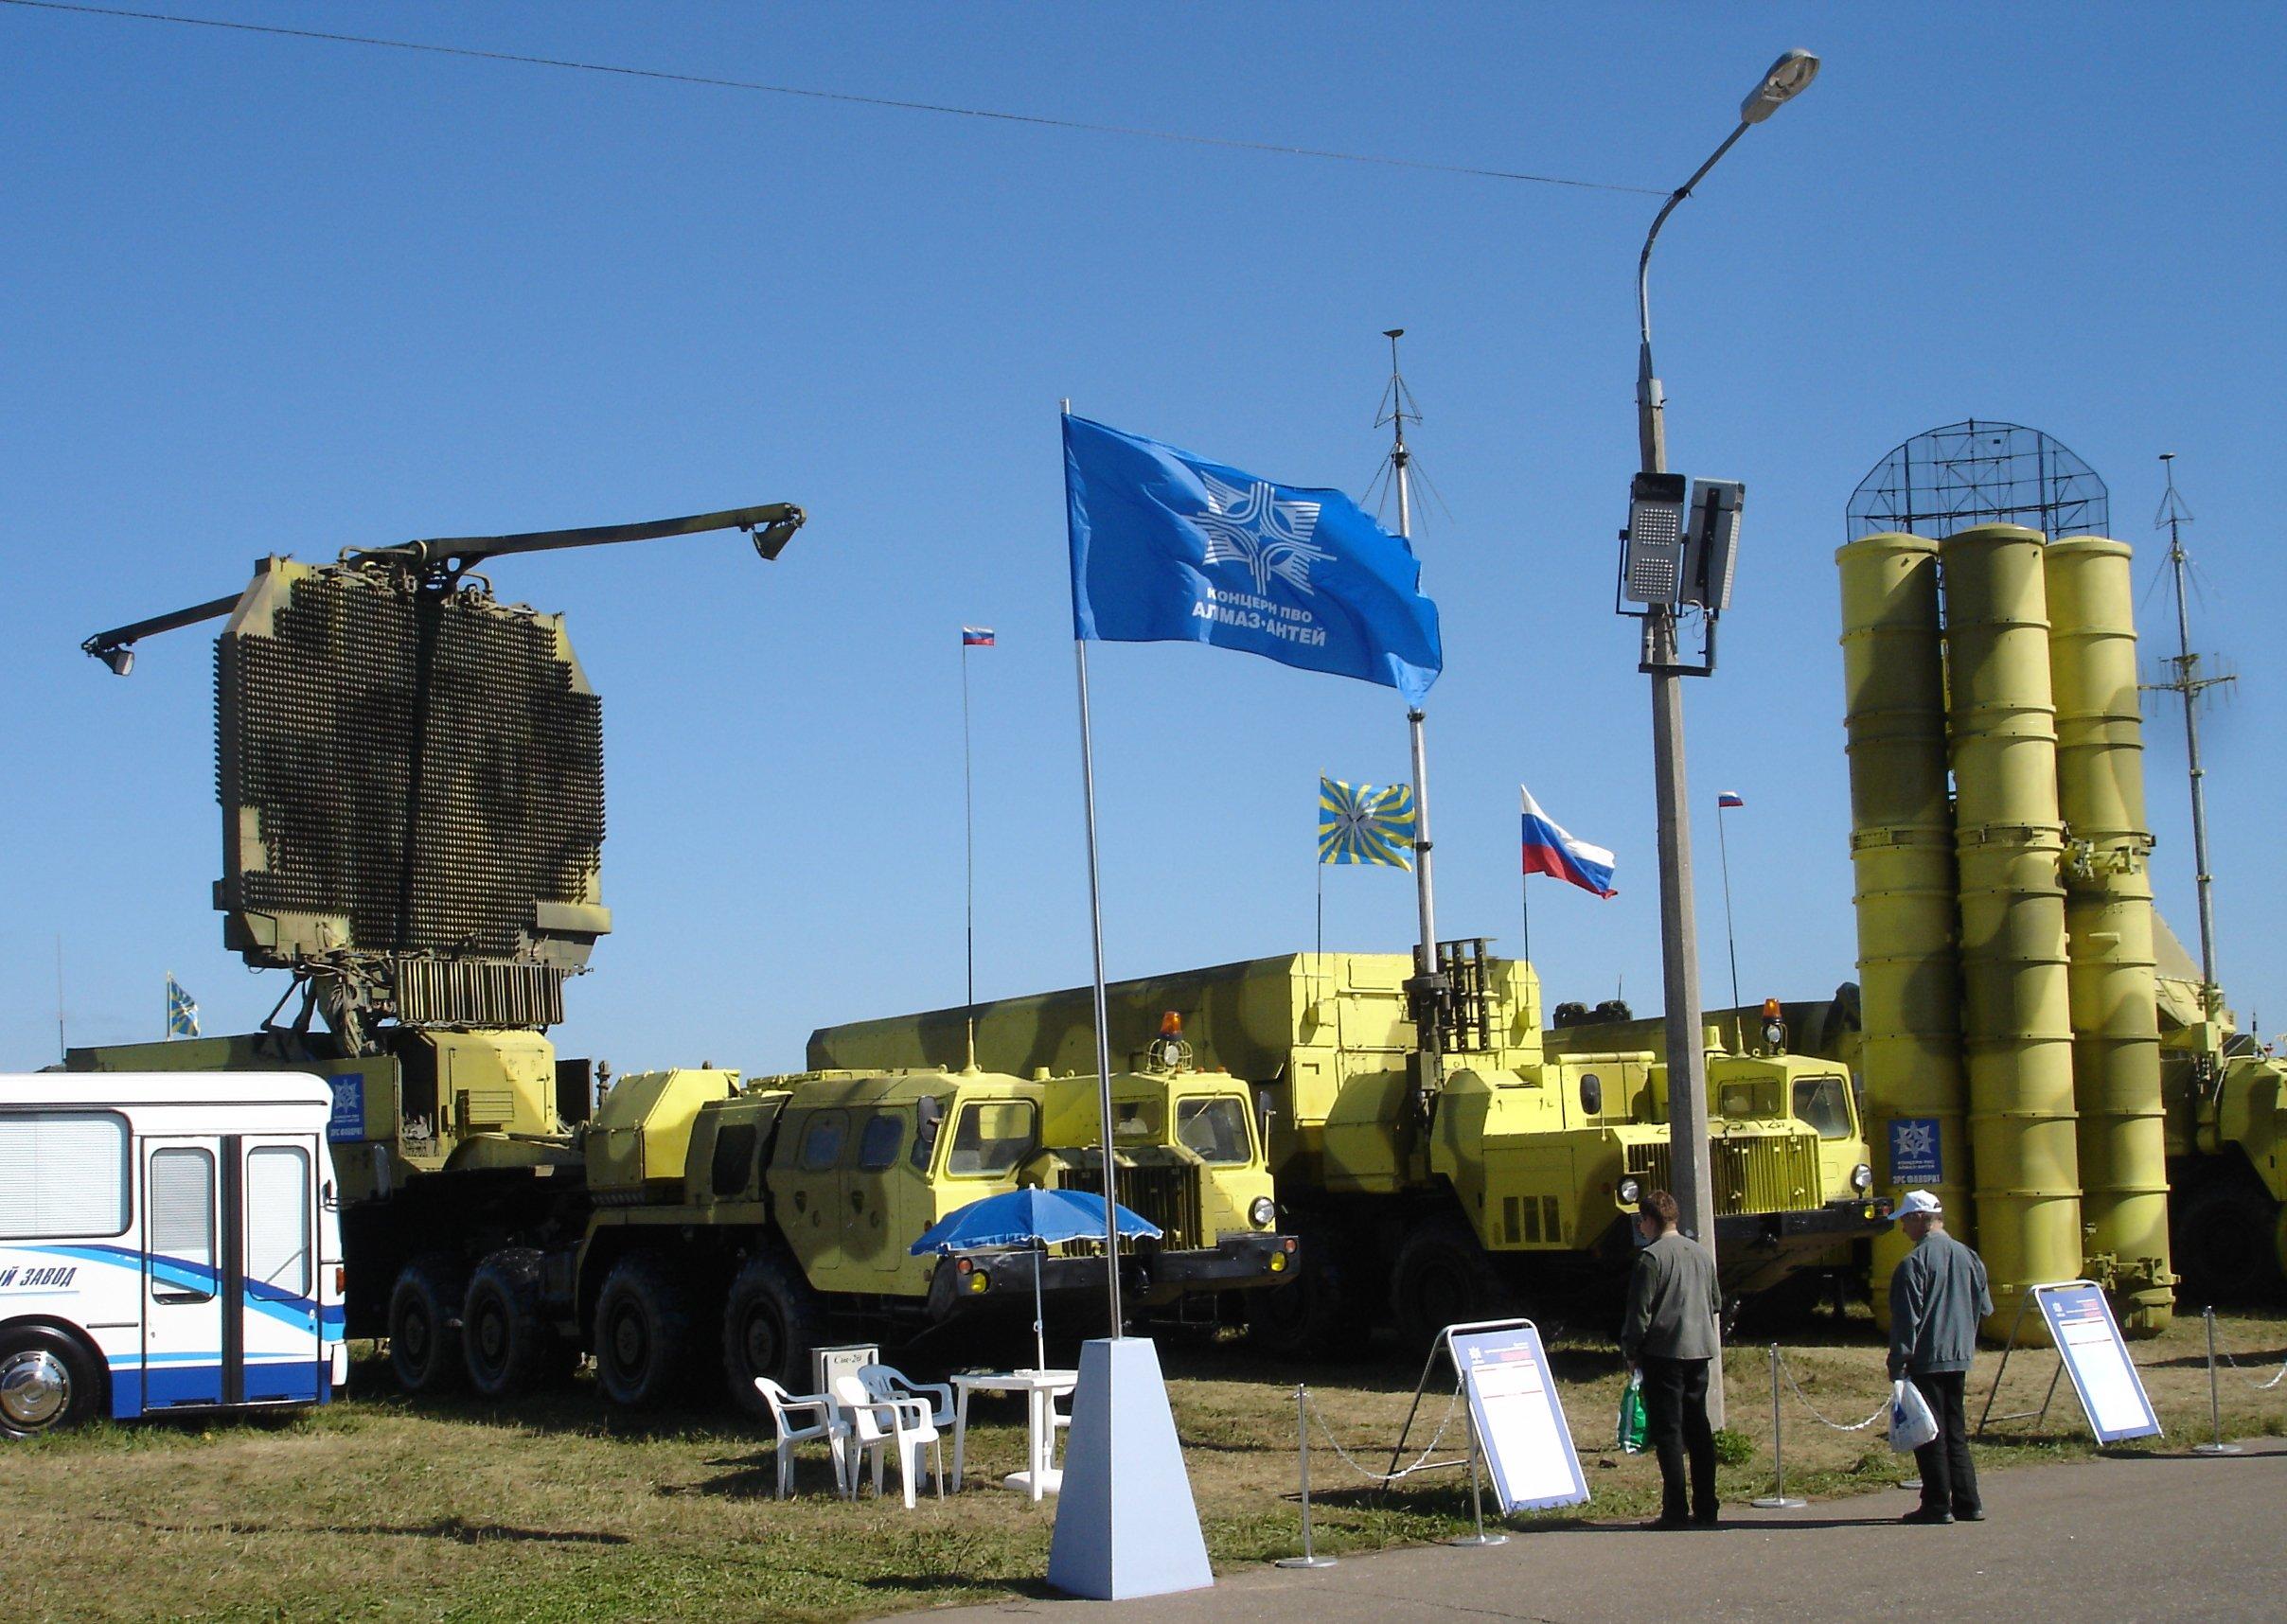 تسليم 8 مقاتلات Su-30 و بطاريتين S-300 للجزائر في 2012 S-300PMU2_complex